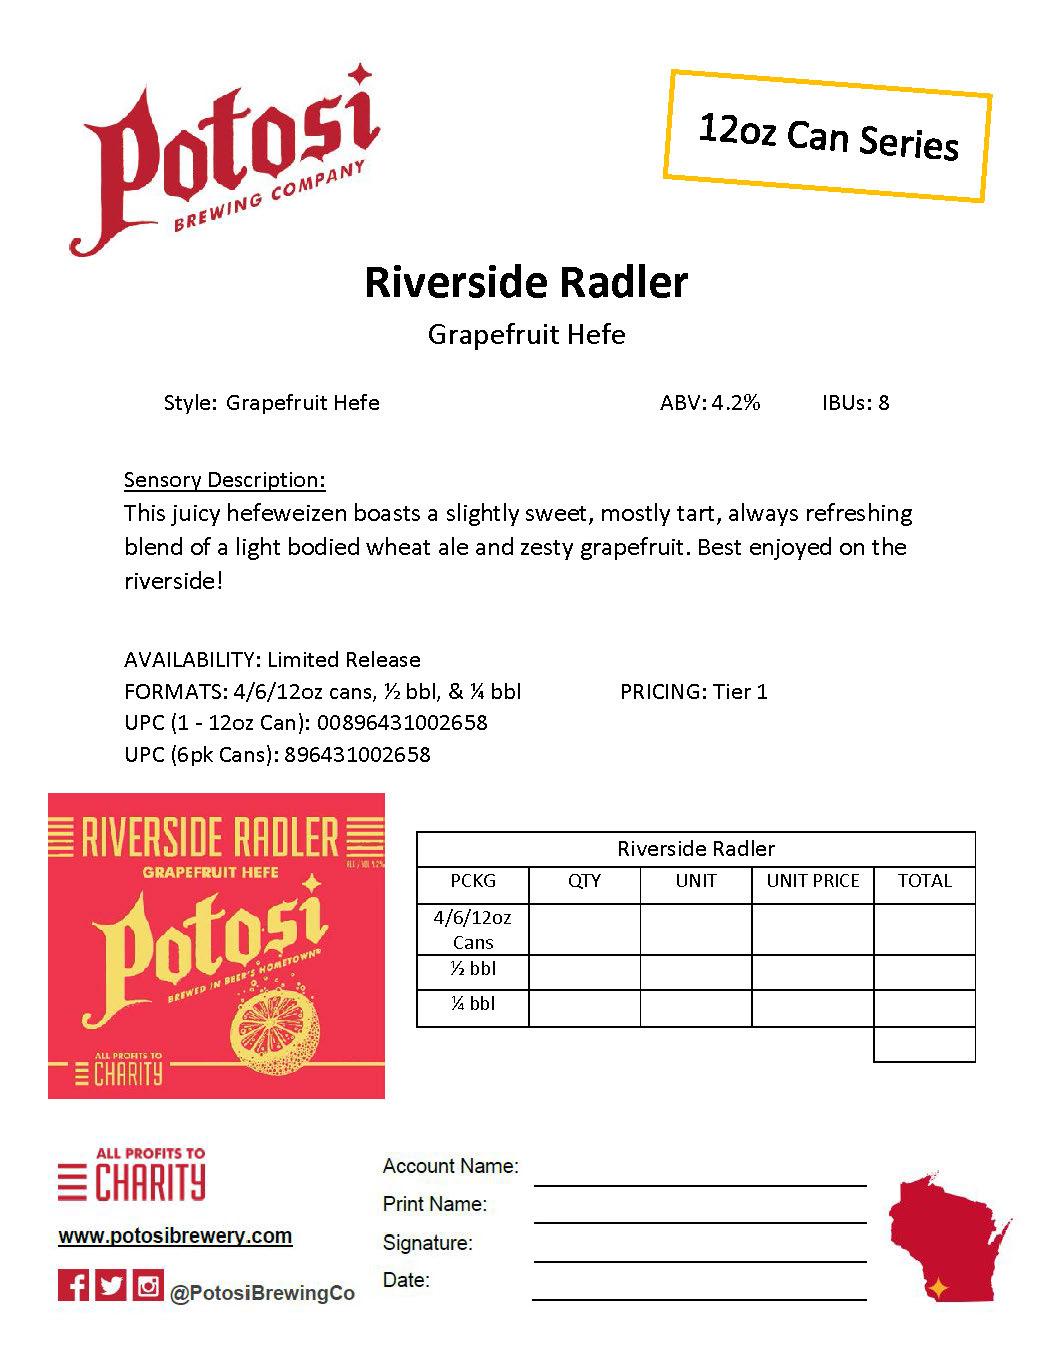 Riverside Radler Sell Sheet Thumbnail - Compressed JPG Image